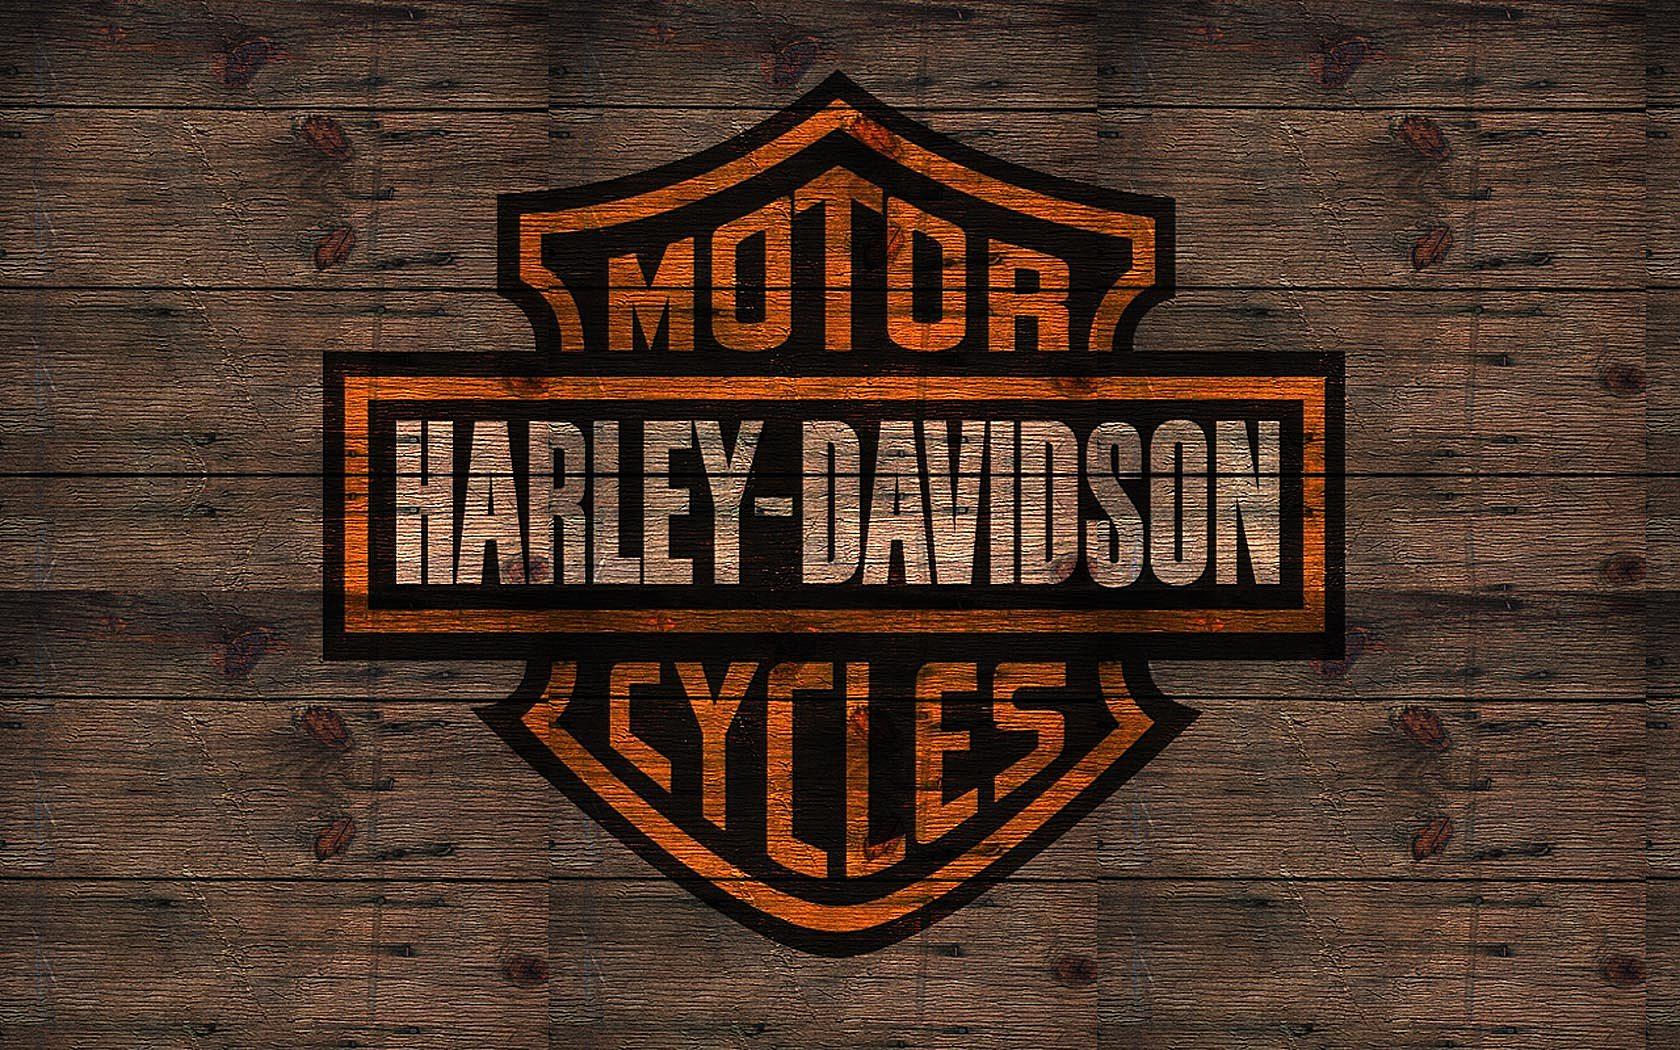 Harley Davidson Wallpaper Screensaver Super Wallpapers 1680x1050